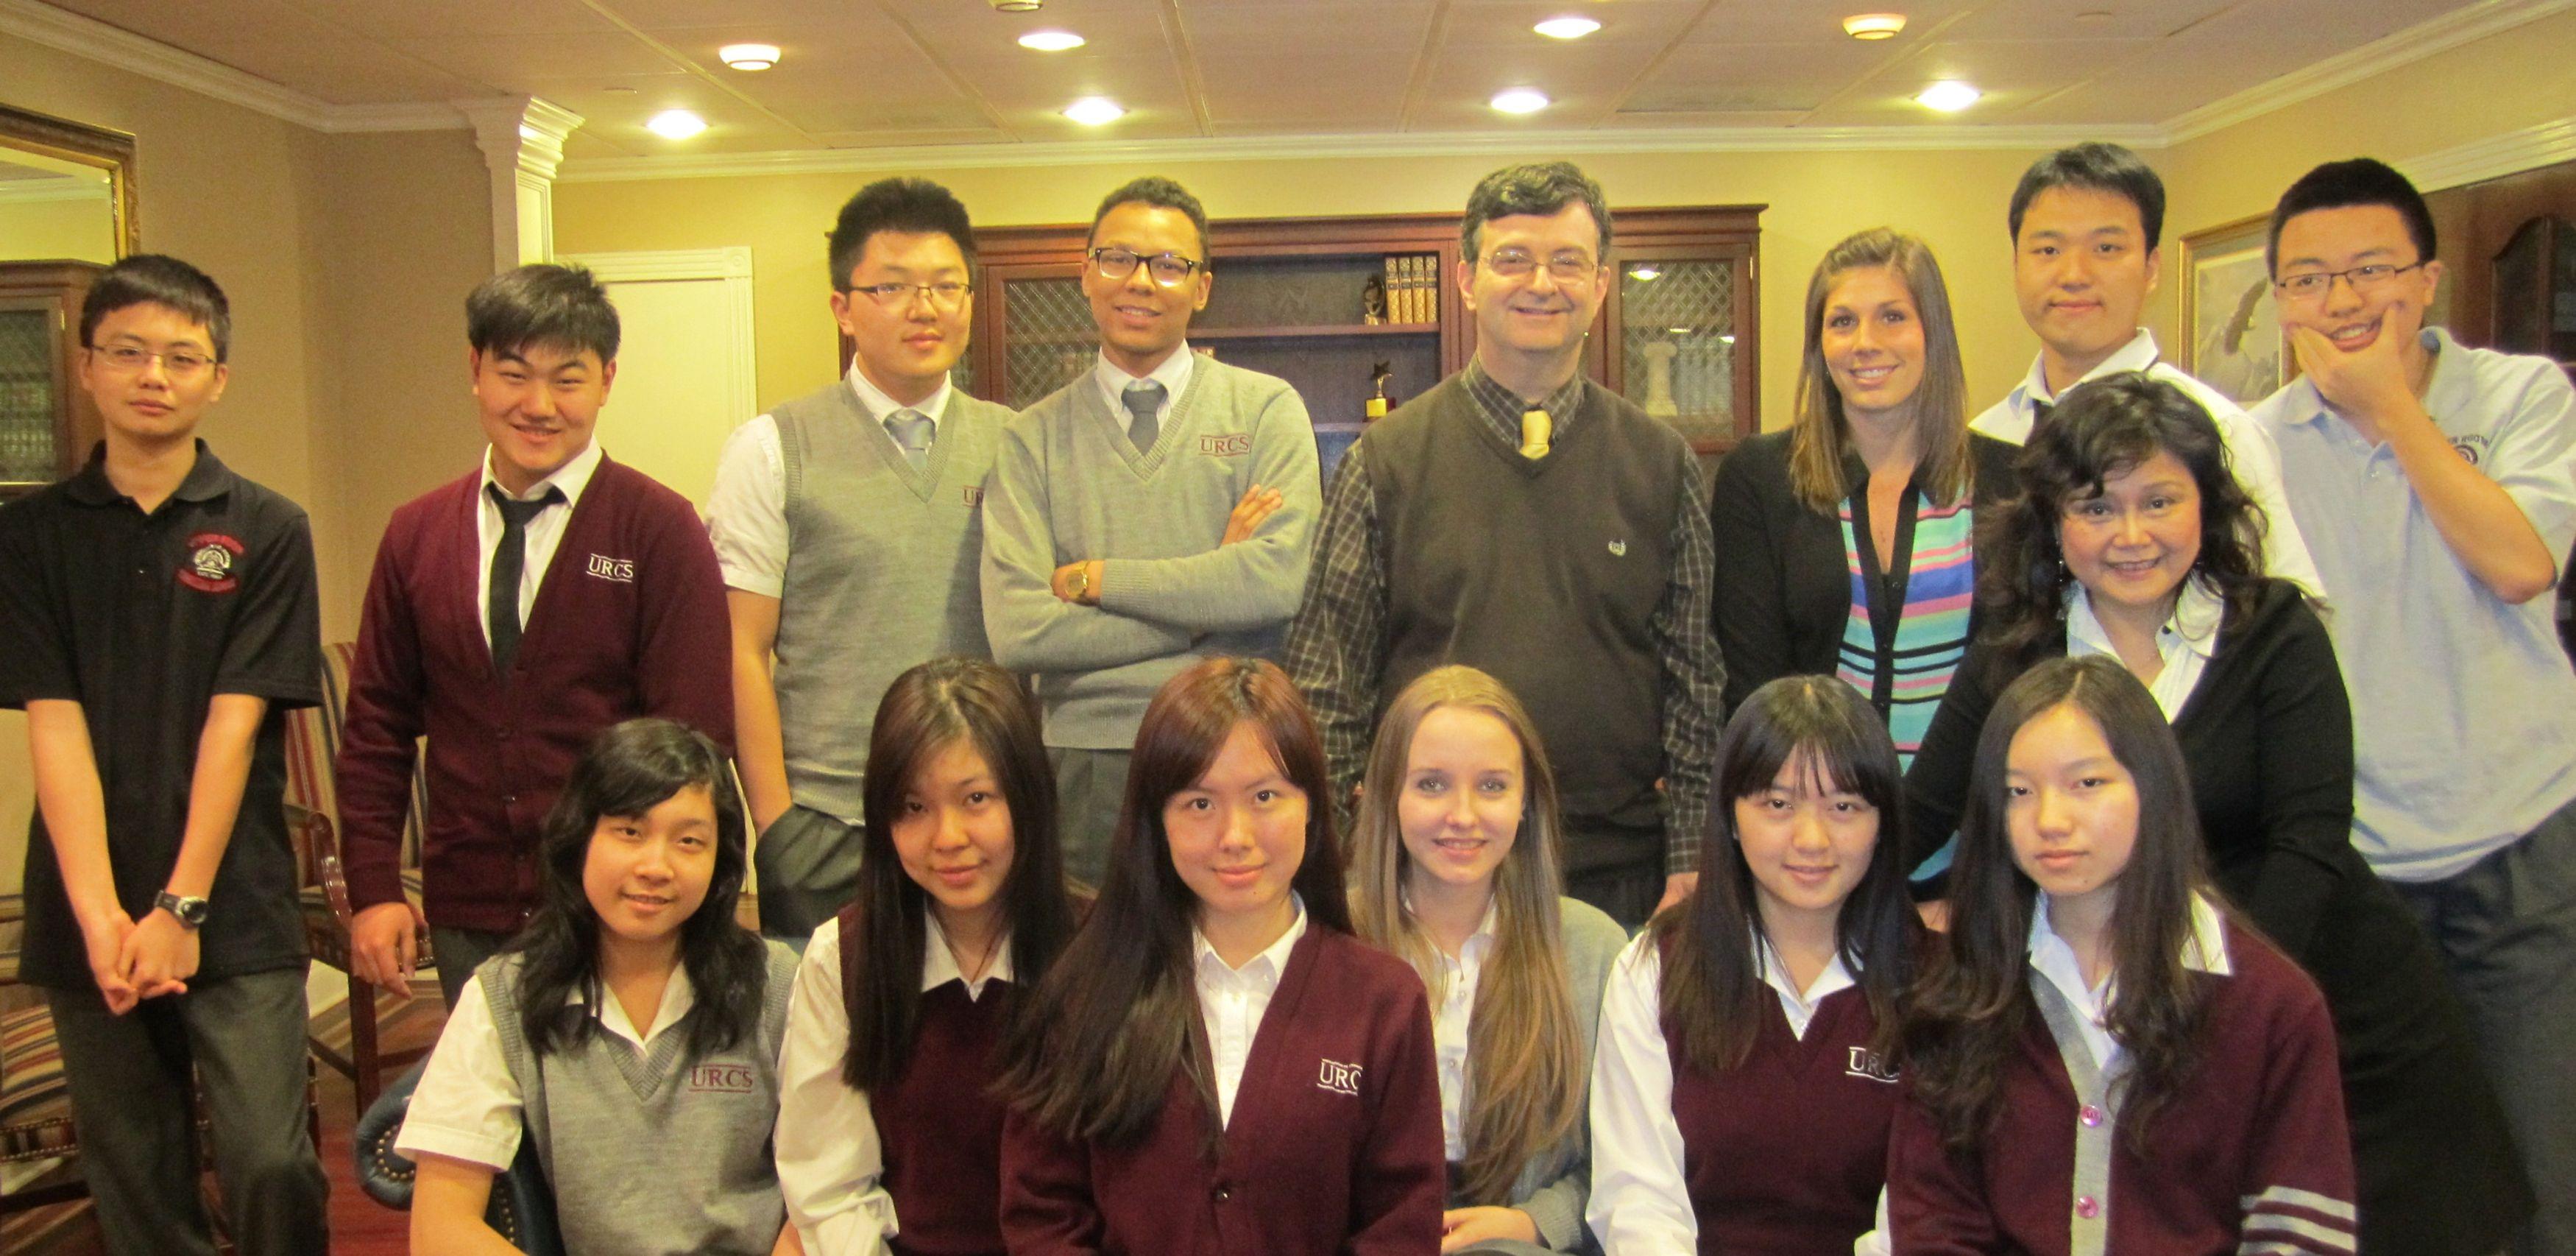 China - Upper Room Christian School